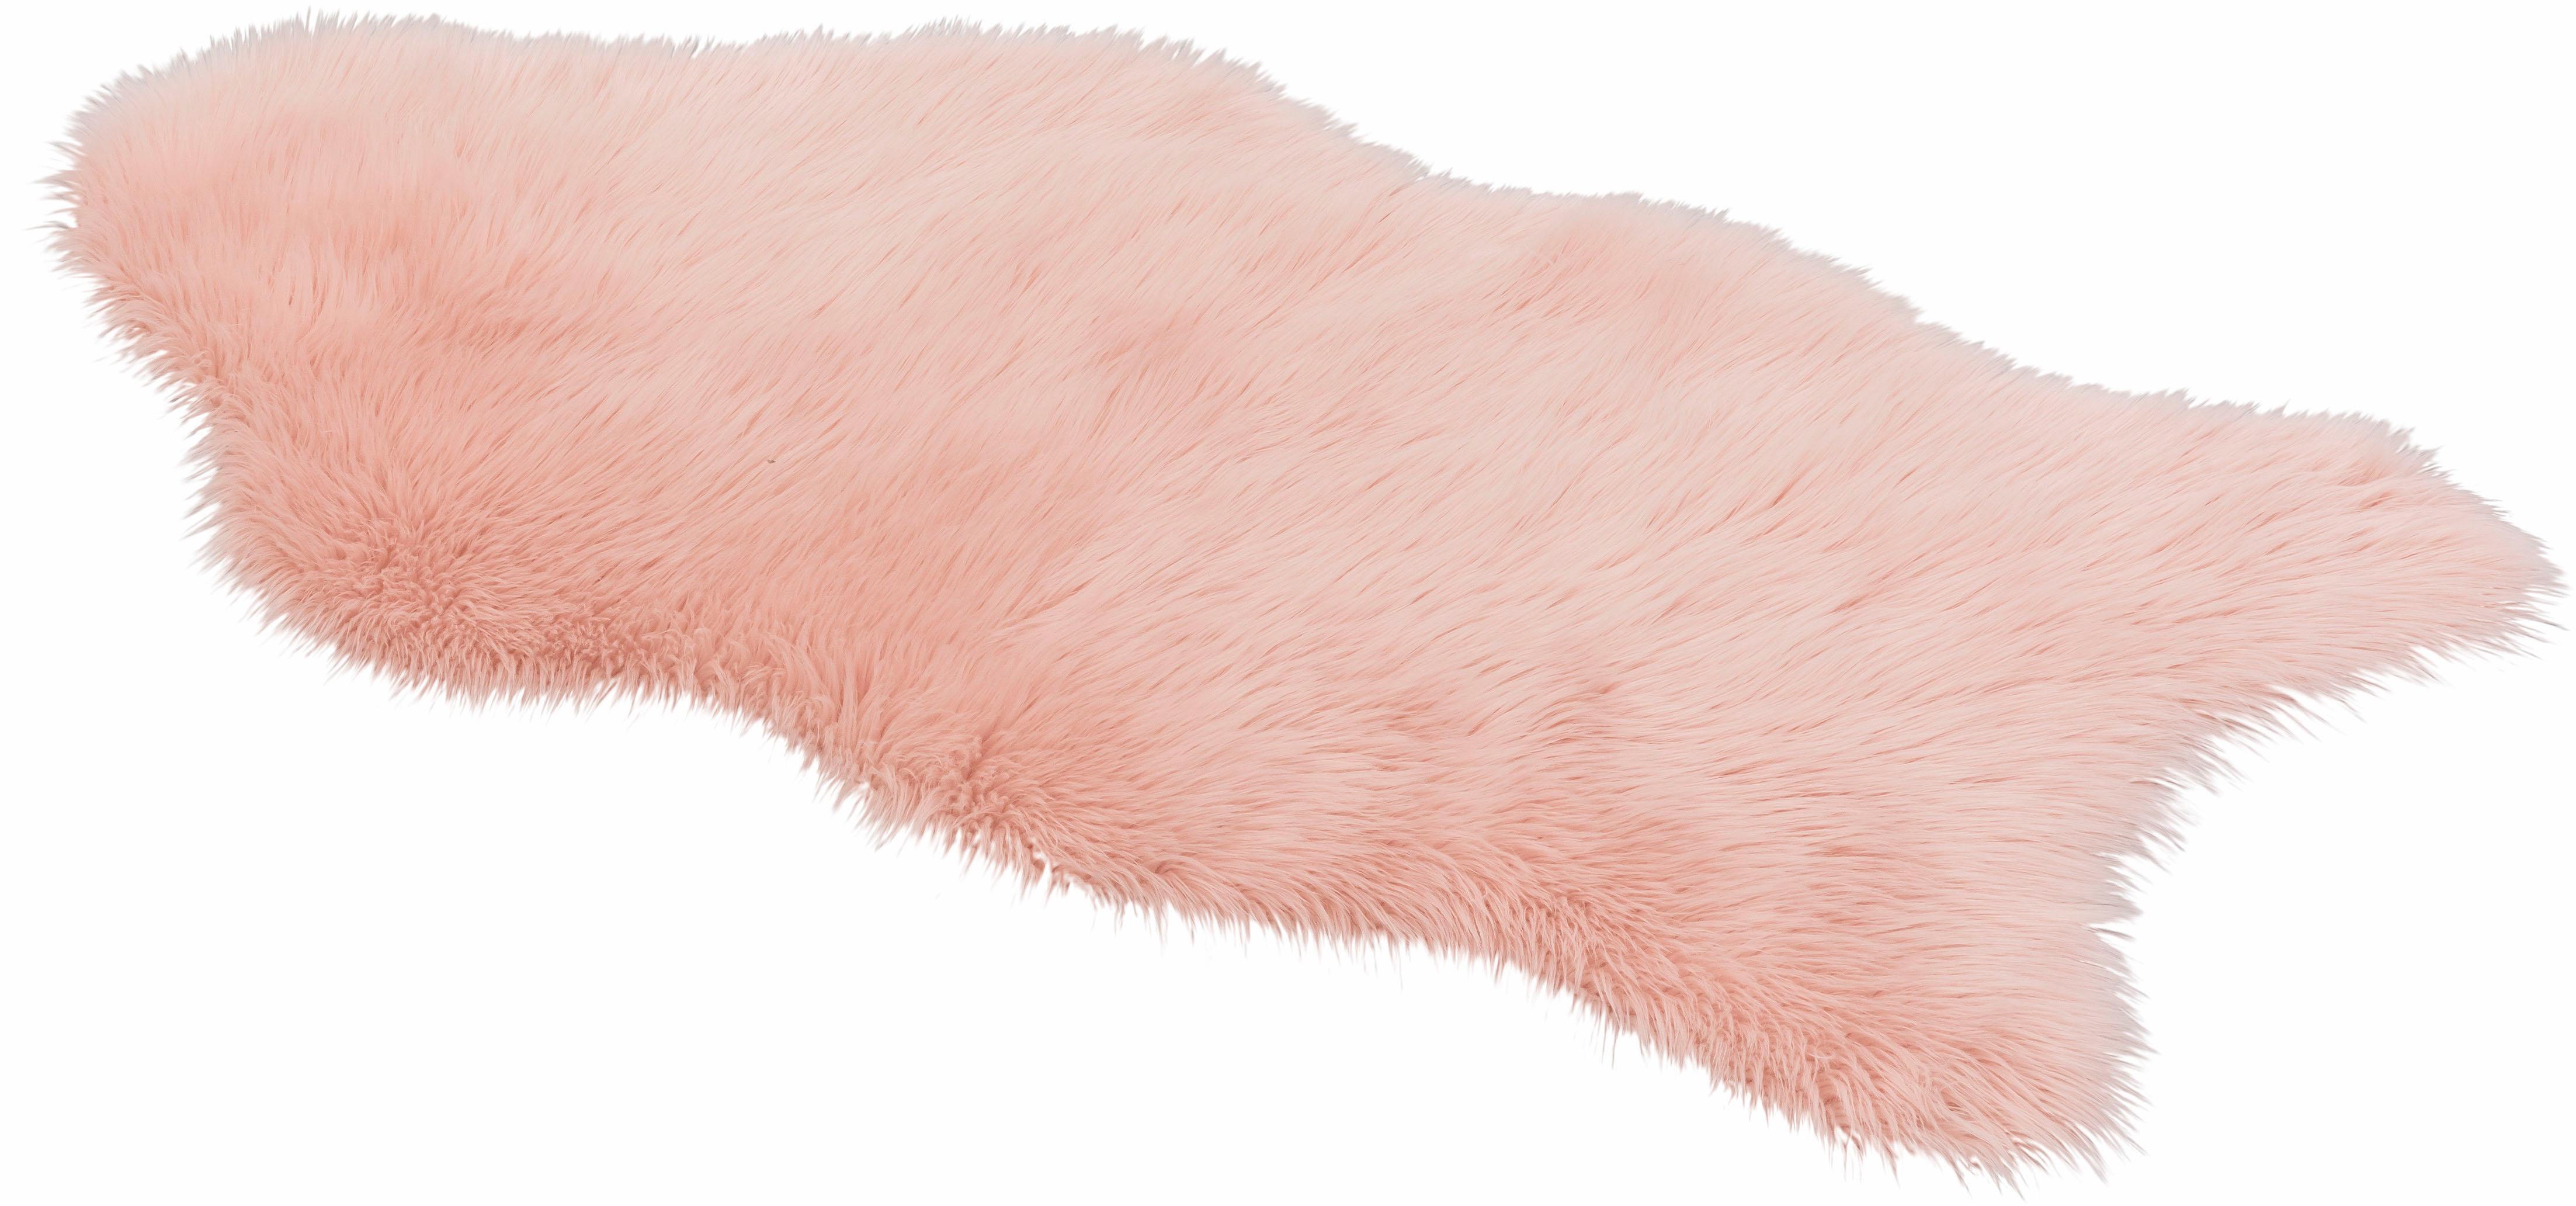 fell teppich rosa trendy fell teppich rosa frisch. Black Bedroom Furniture Sets. Home Design Ideas